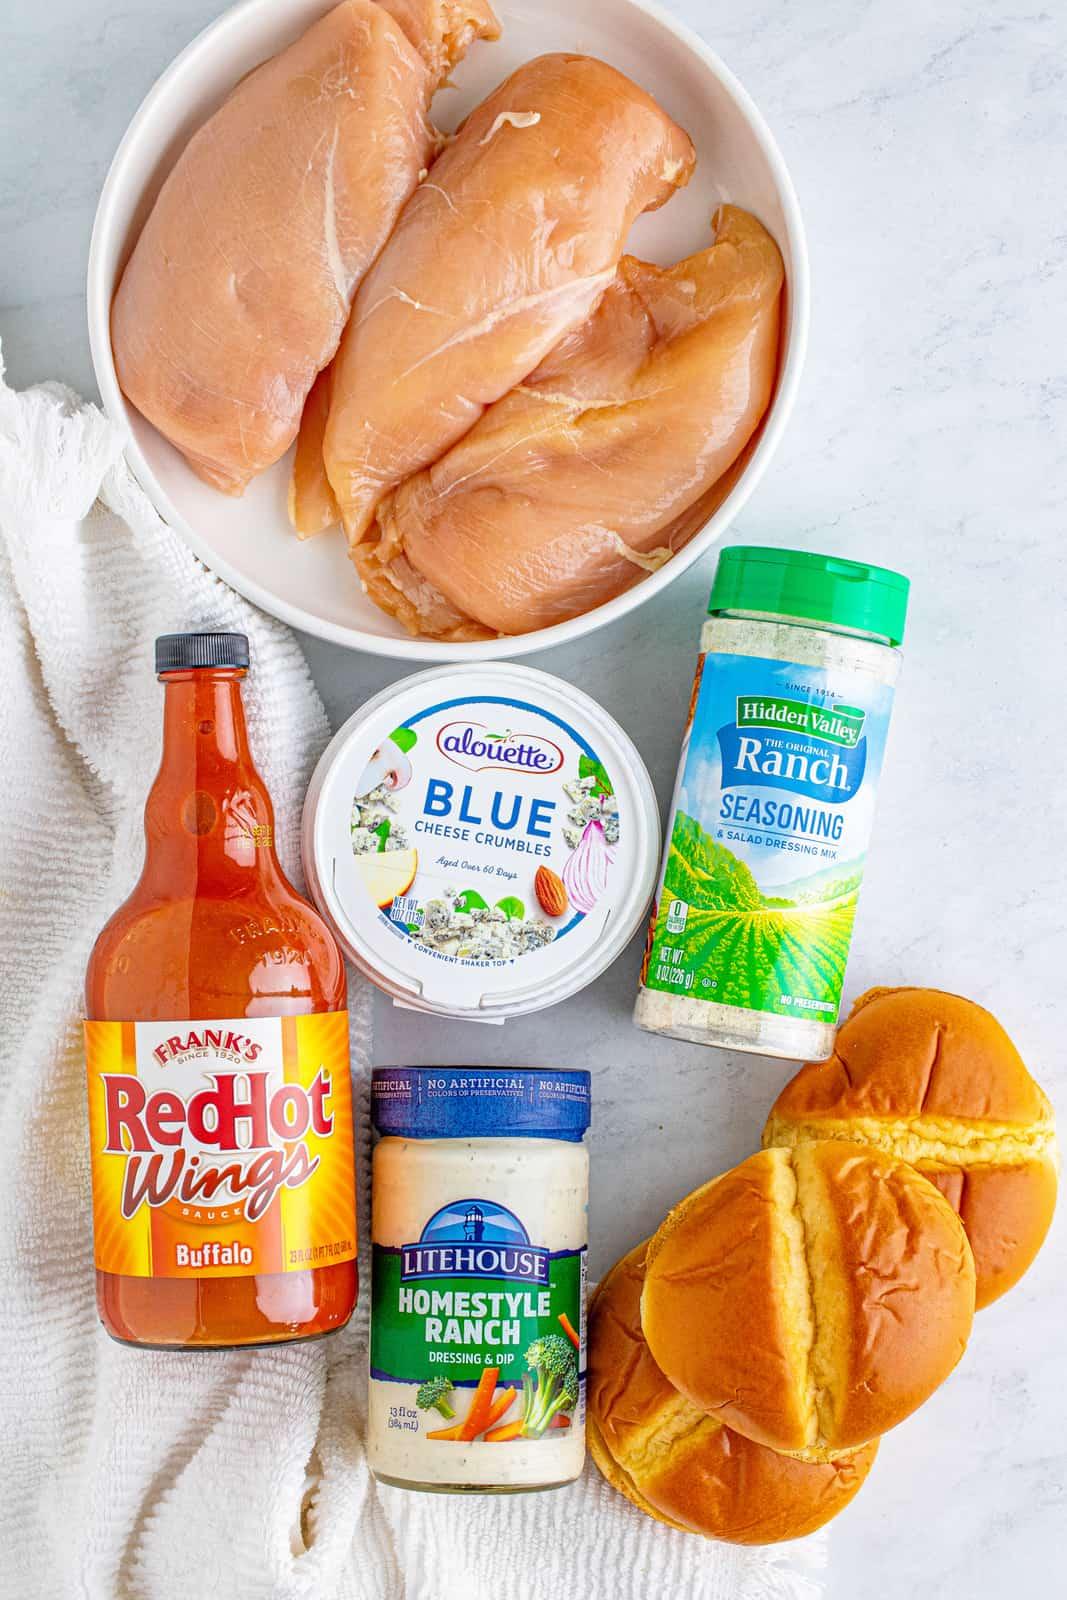 Ingredients needed to make Buffalo Chicken Sandwiches